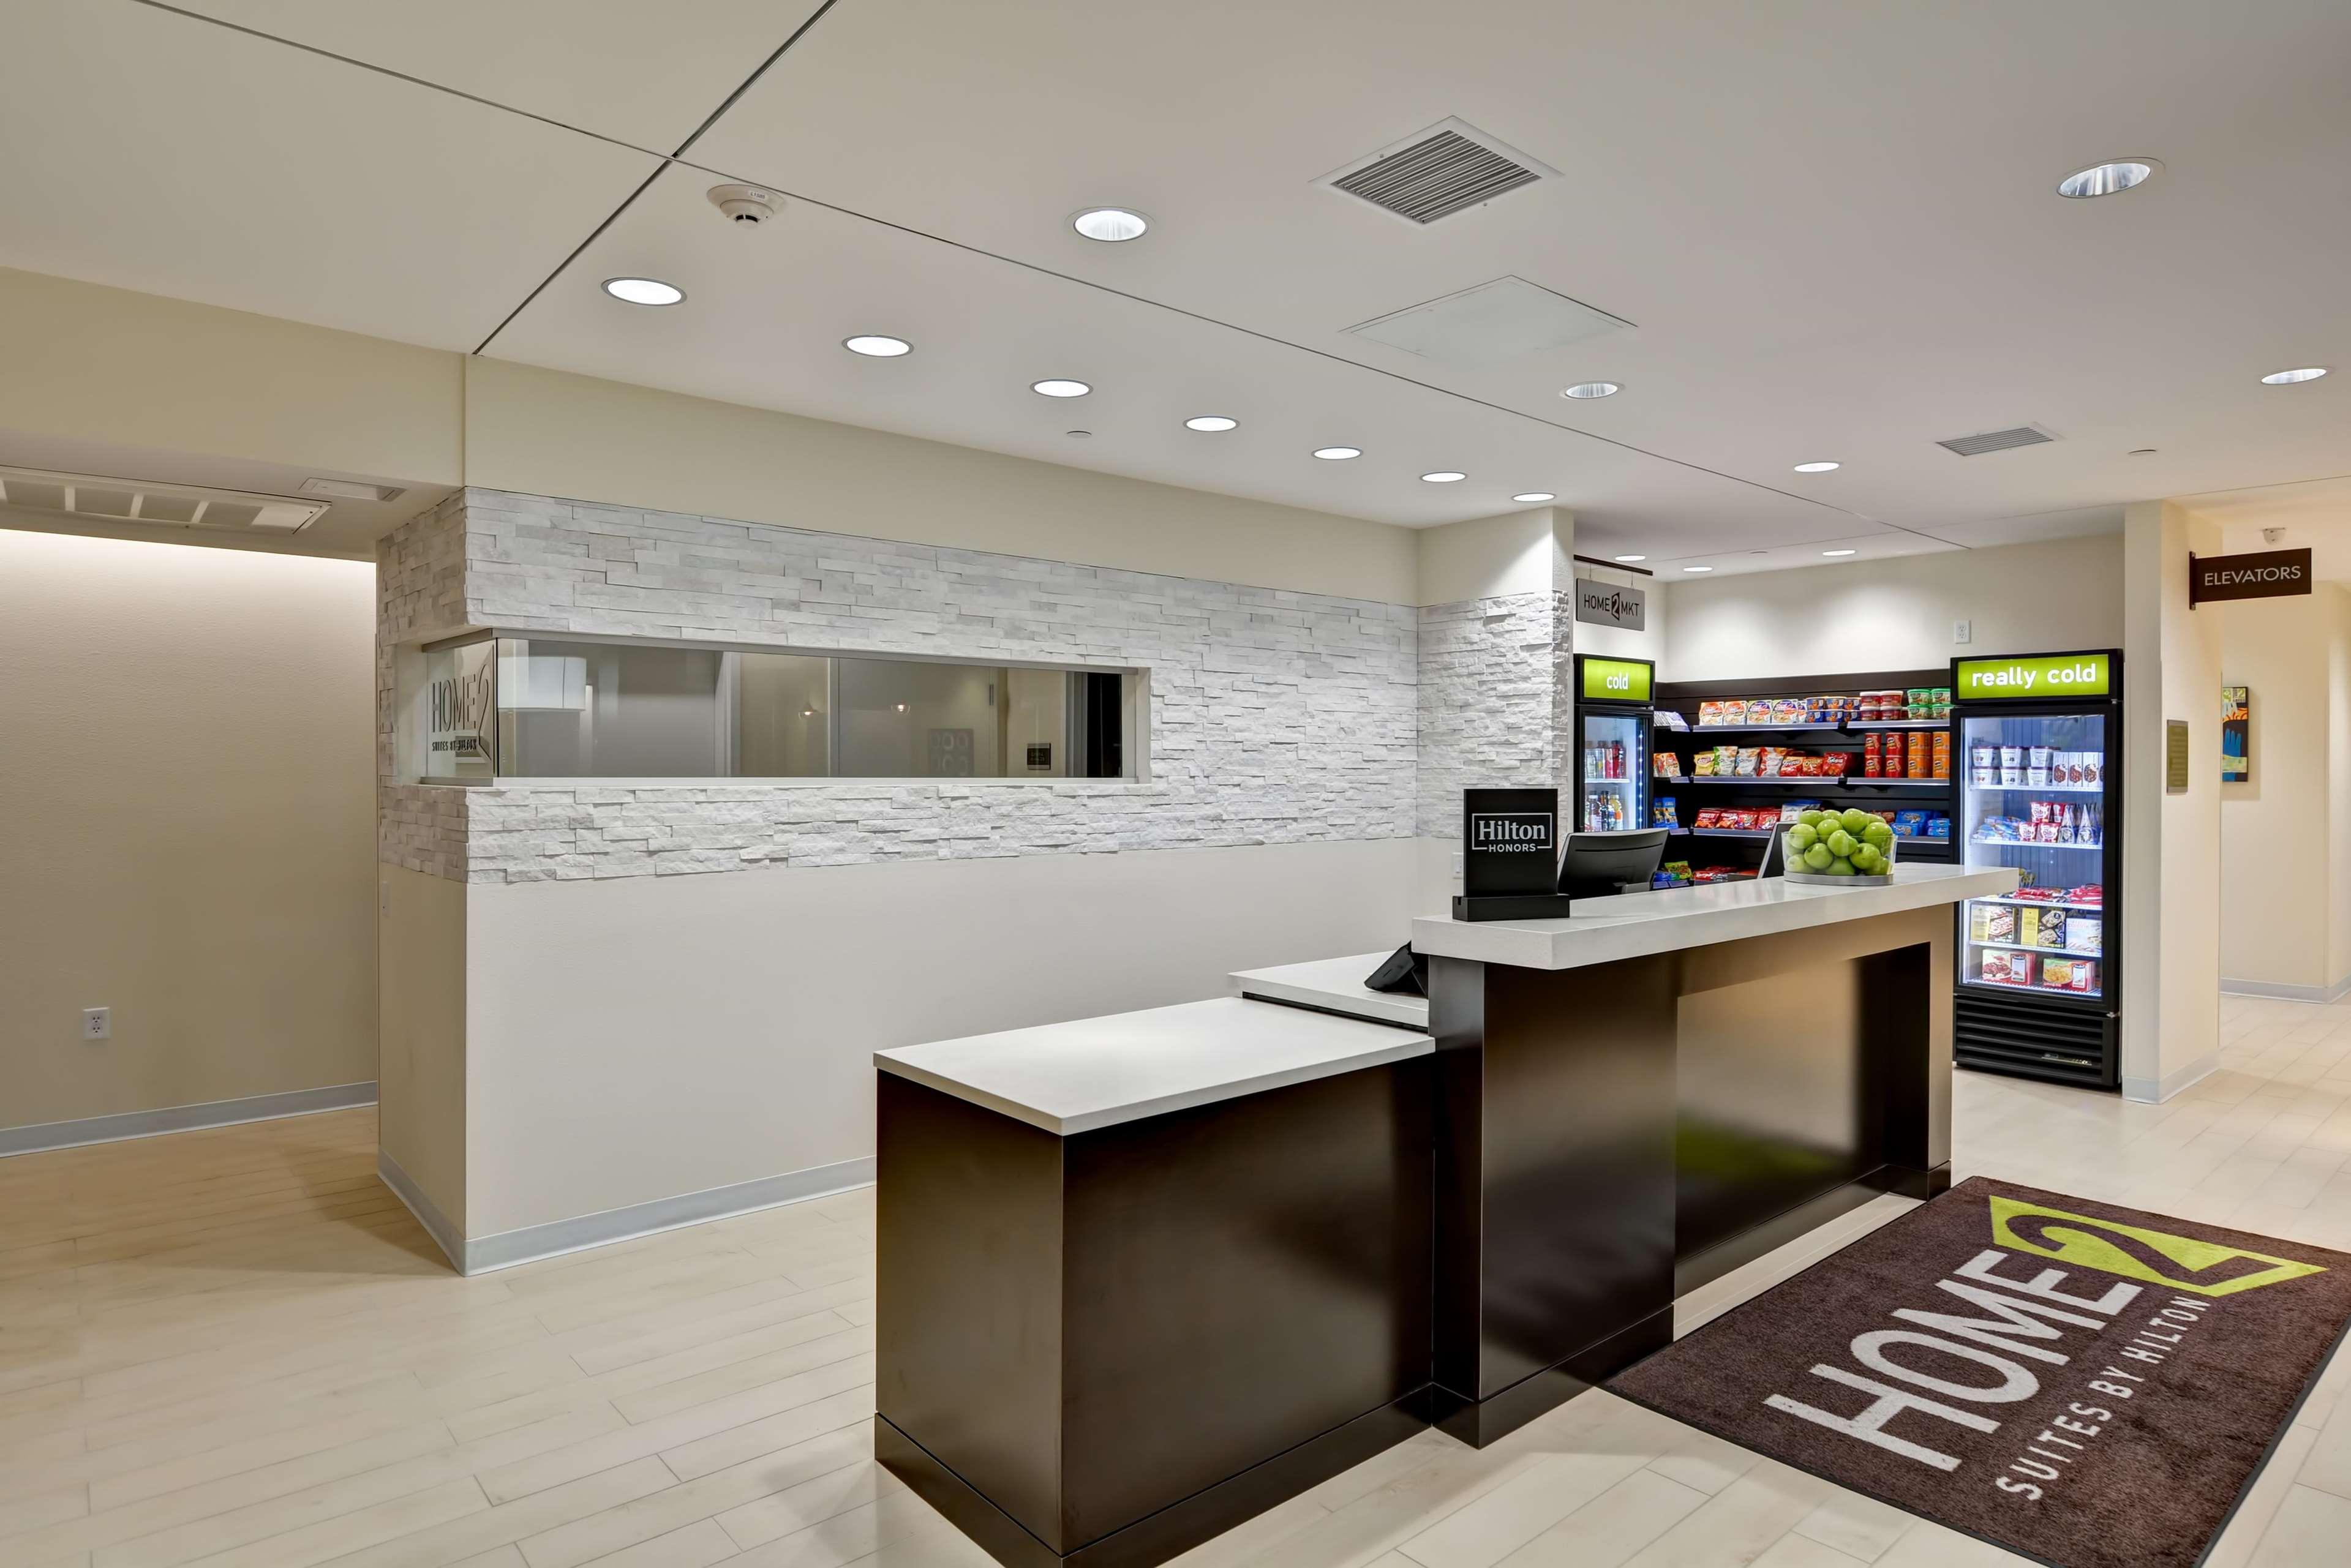 Home2 Suites by Hilton Azusa image 33